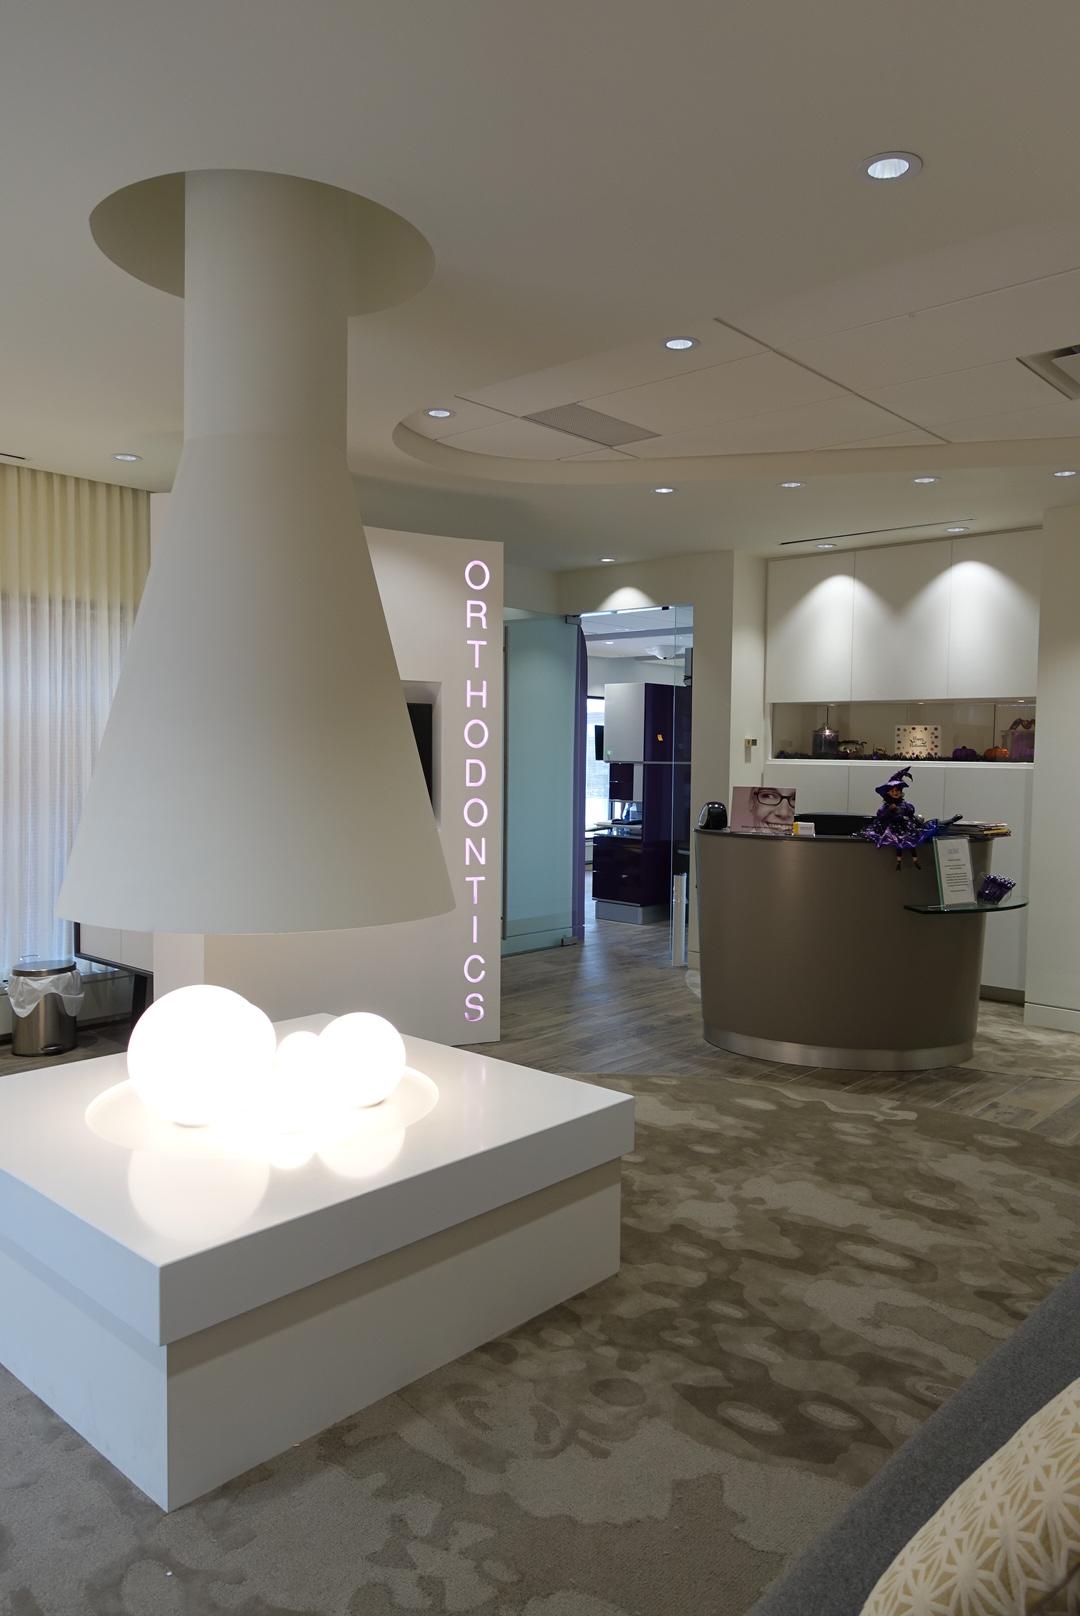 orthodontic office design calgary alberta joearchitect